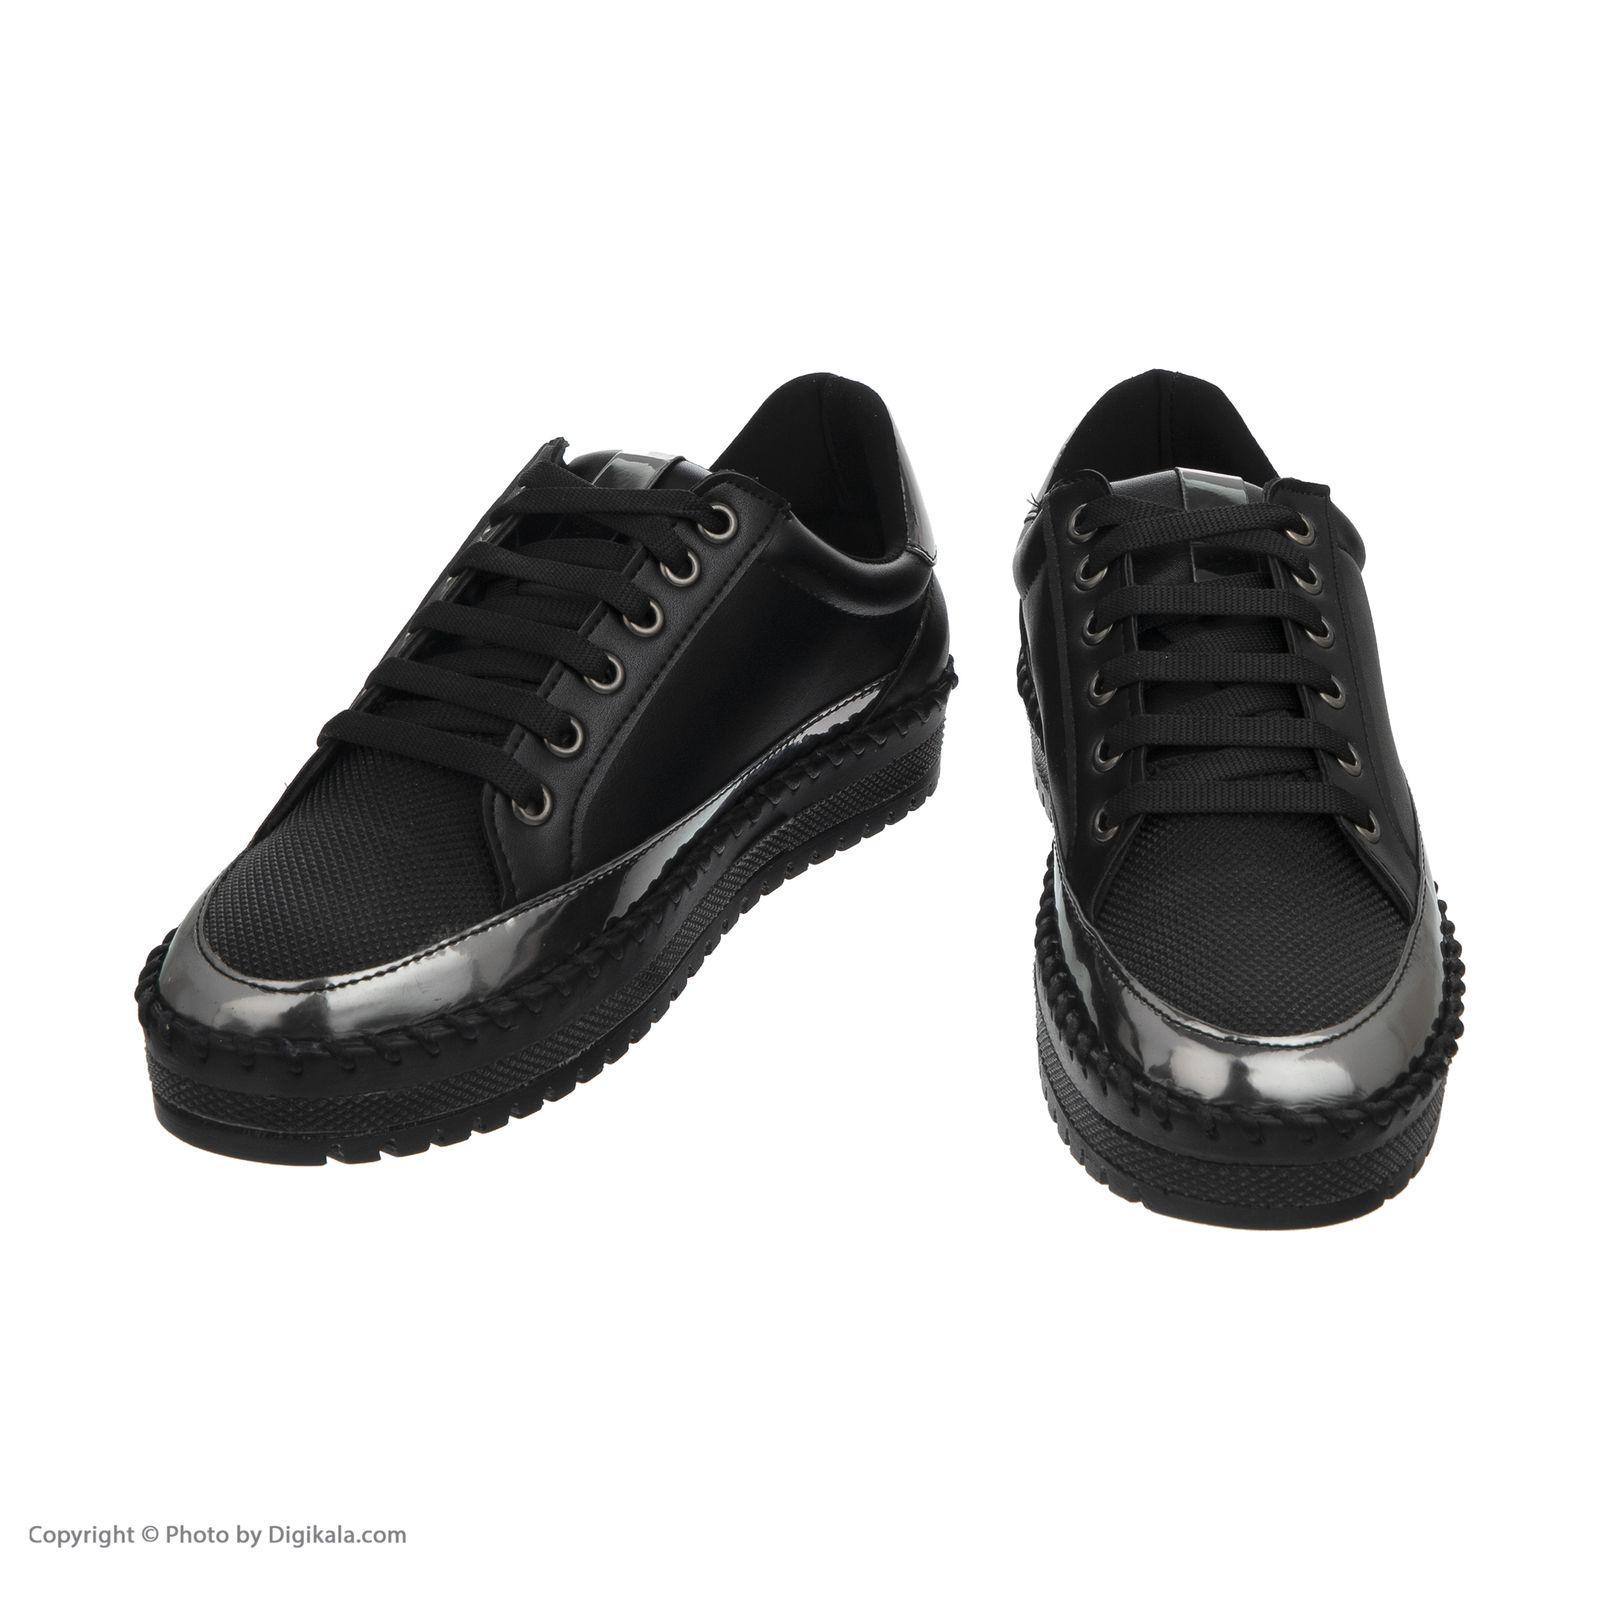 کفش روزمره زنانه ام تو مدل 99-1005 main 1 3